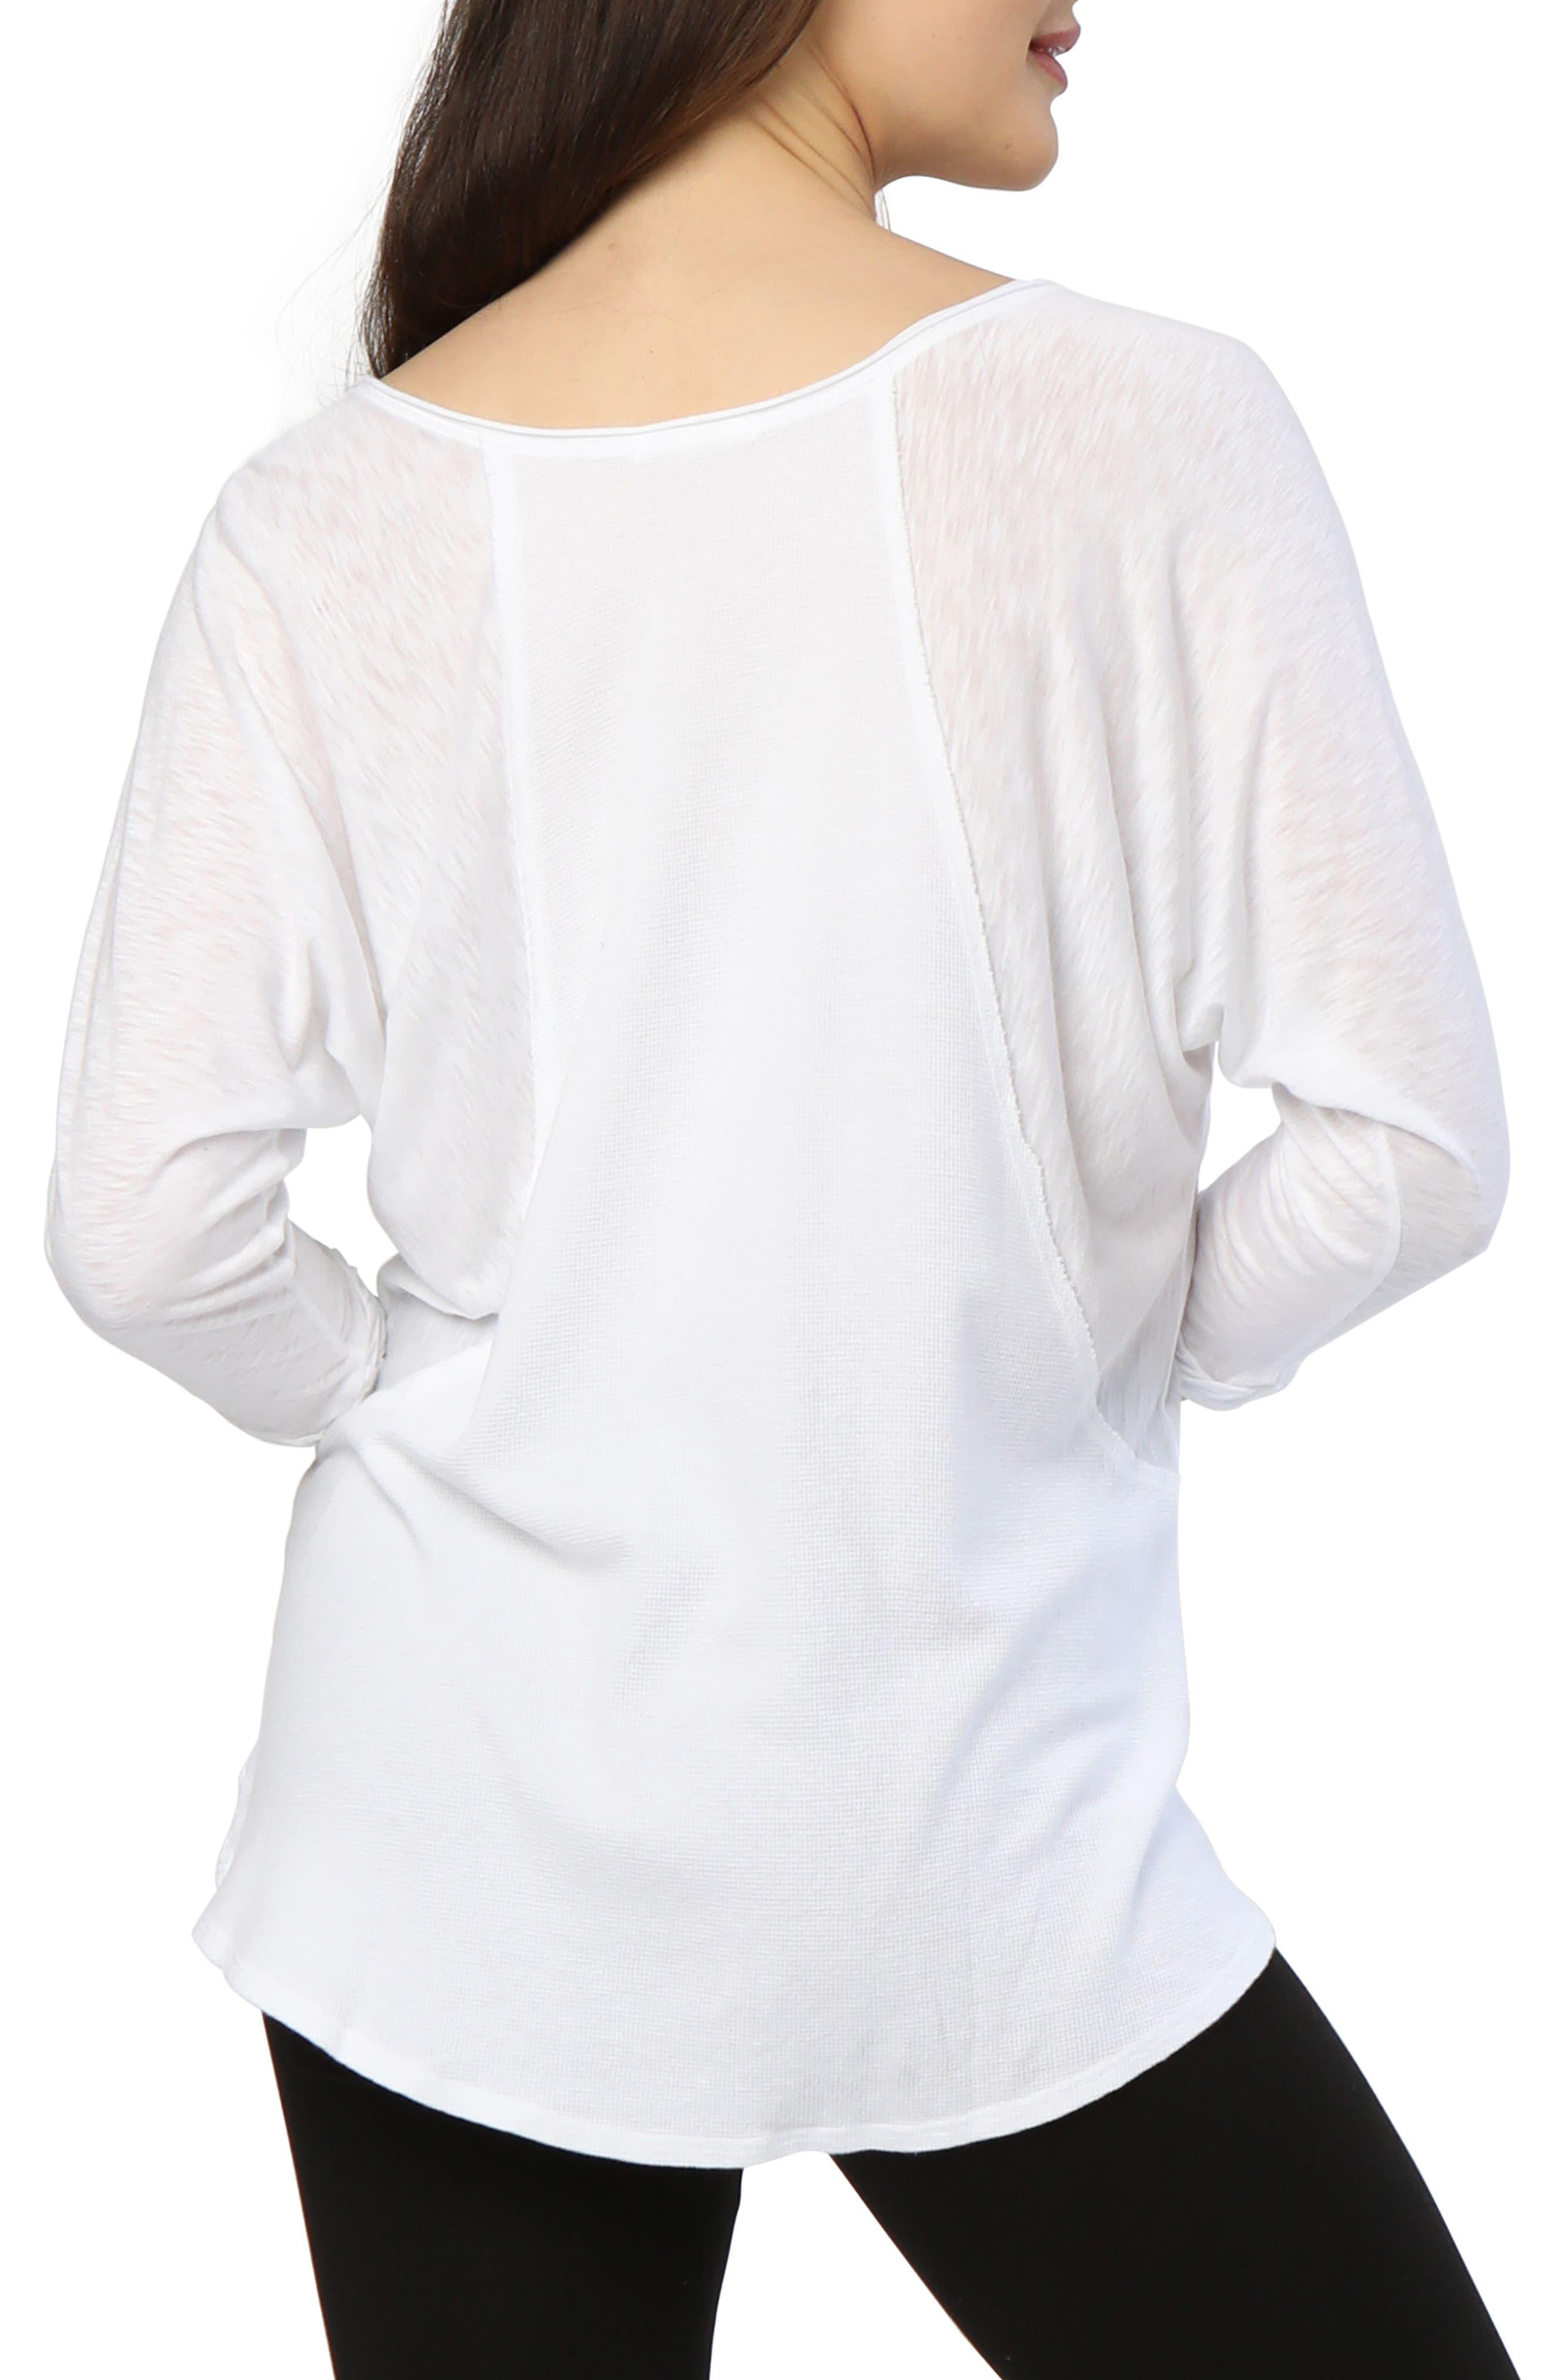 Kris Long-Sleeve Top,                             Alternate thumbnail 2, color,                             White